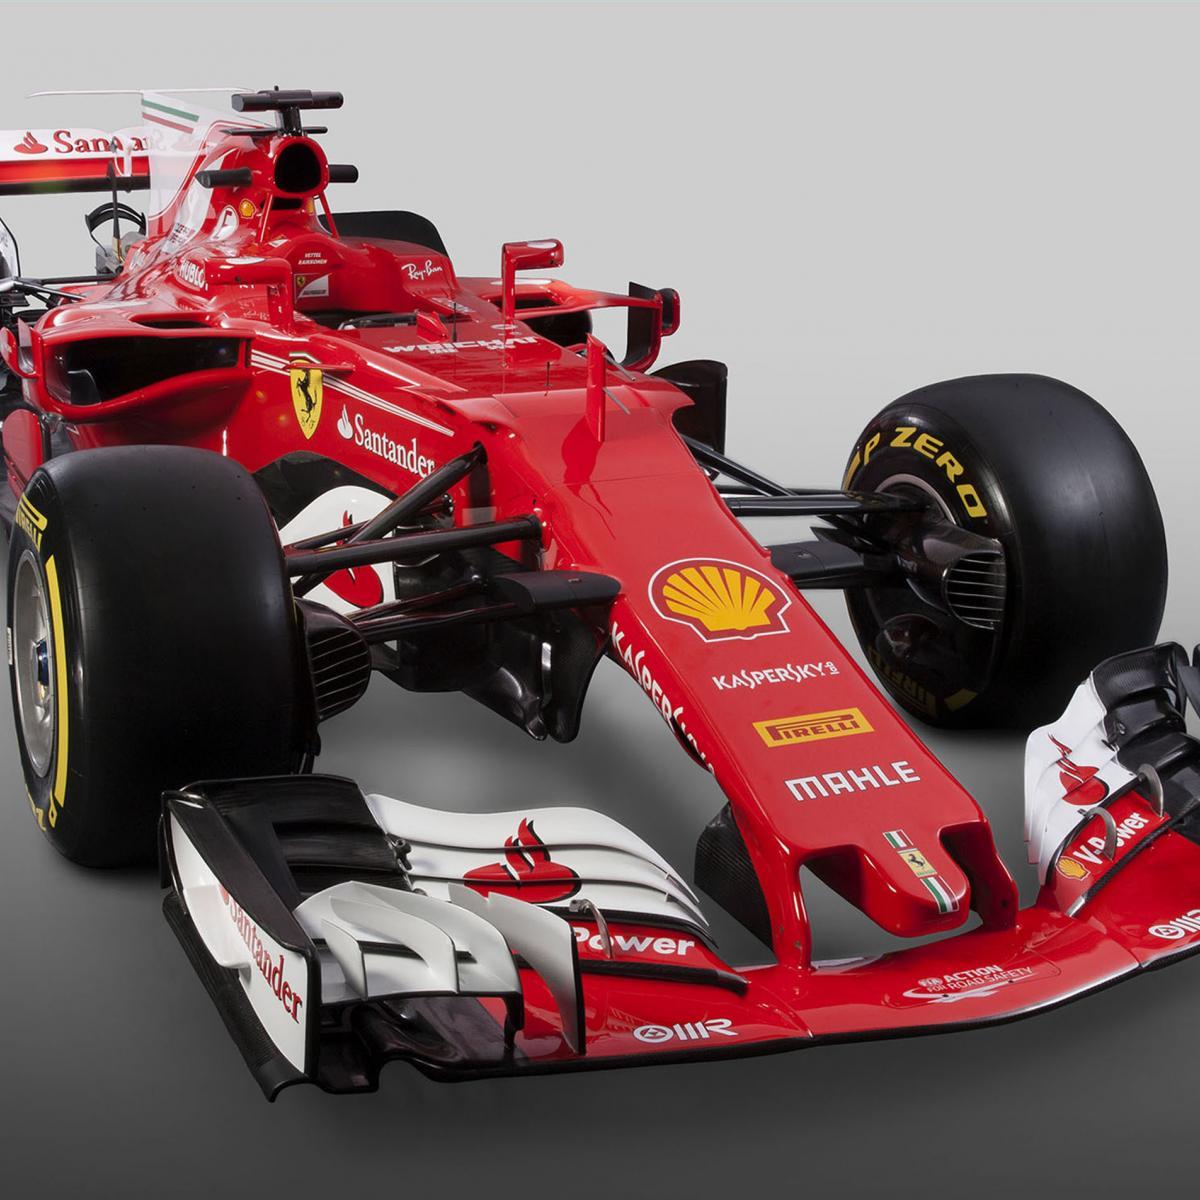 Ferrari Truck: Ferrari SF70H F1 Car Launch: 2017 Images And Details